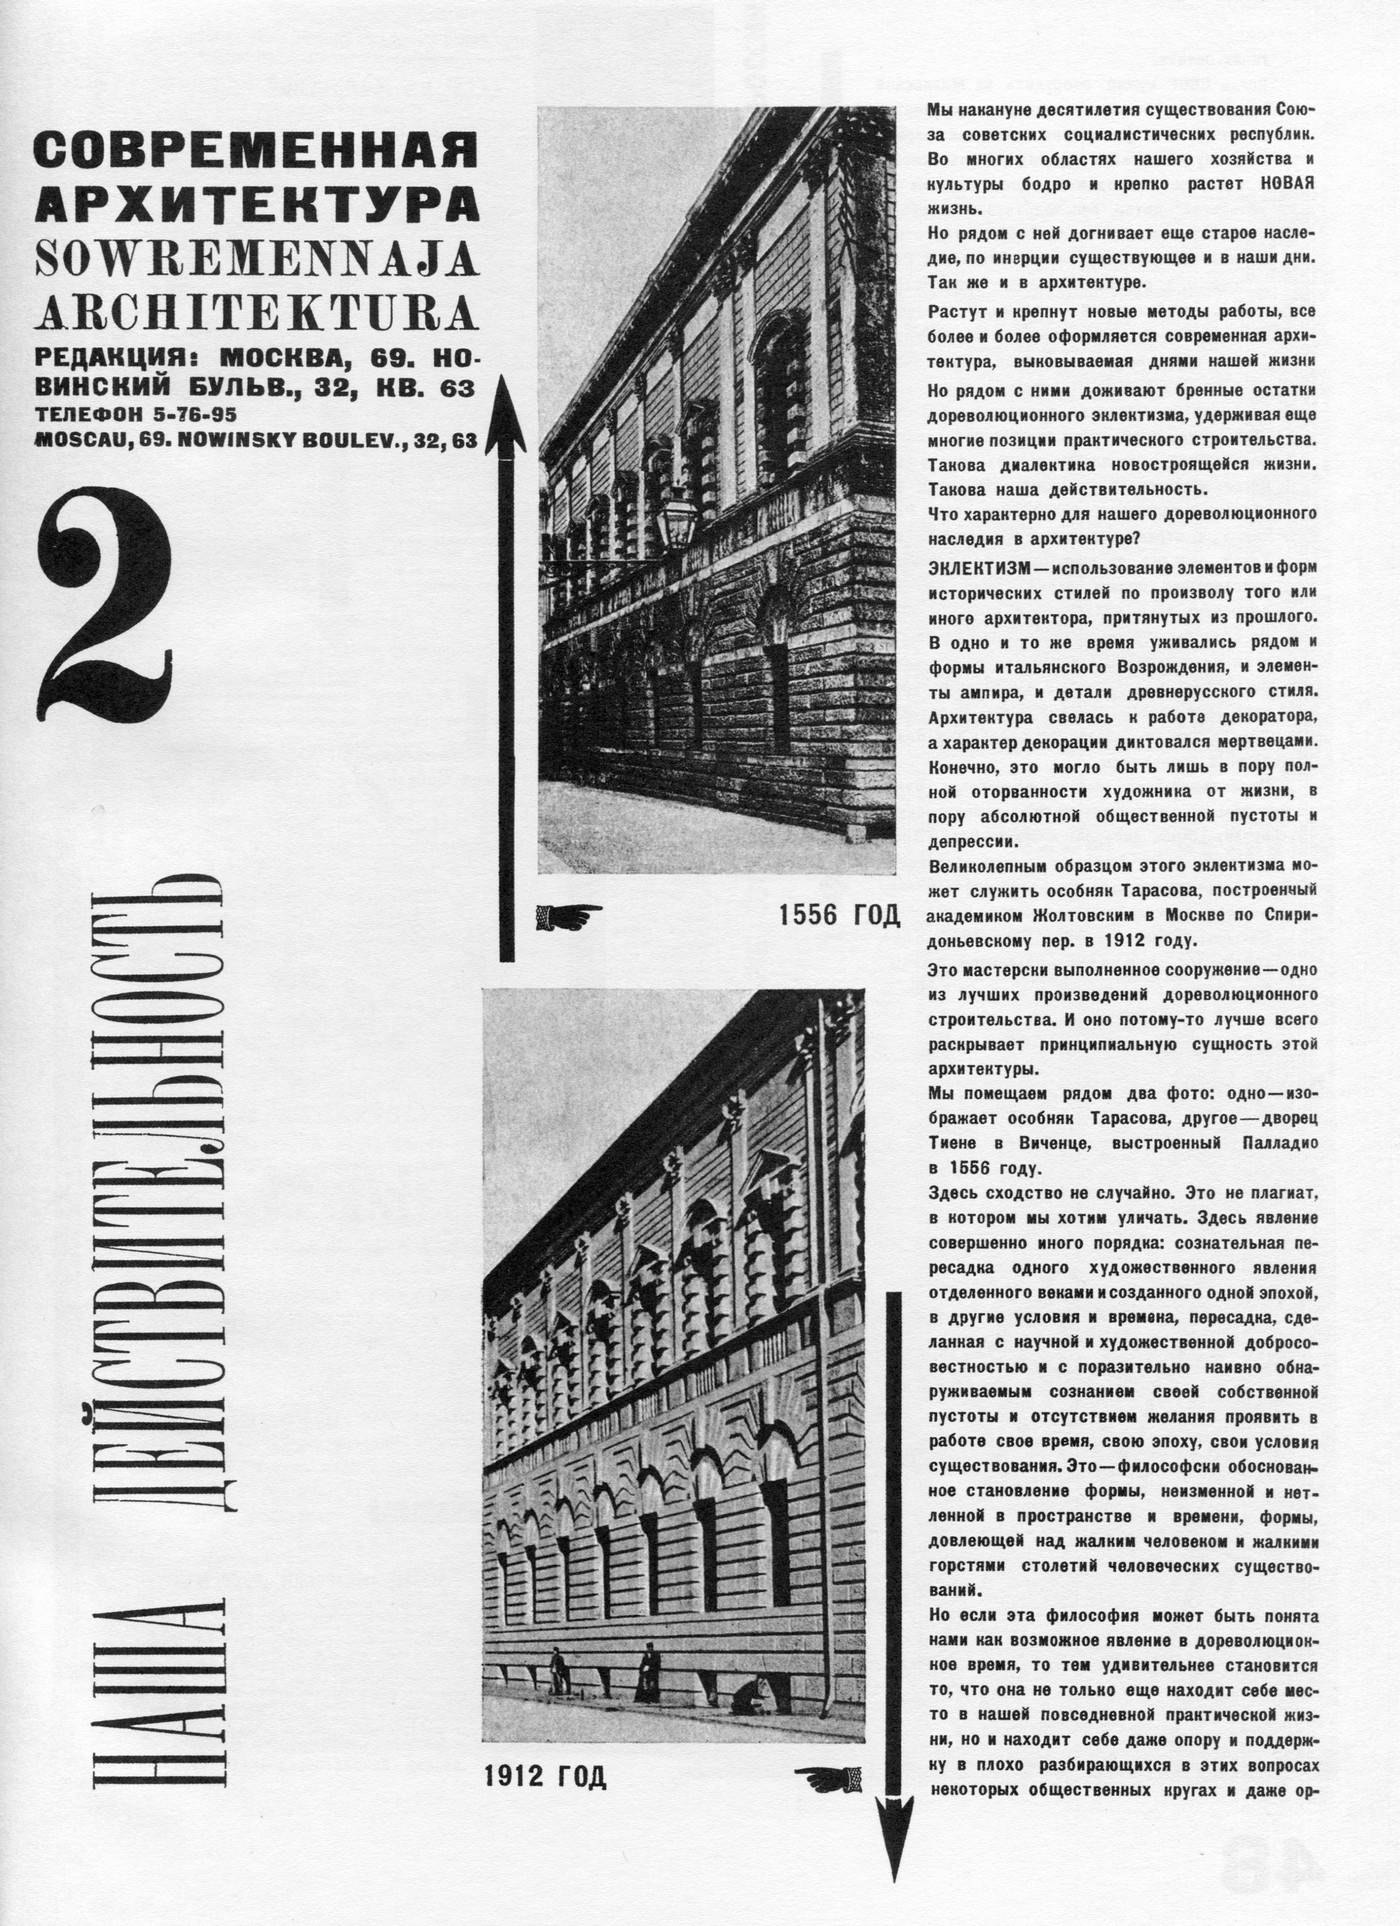 tehne.com-sa-1927-2-1400-003